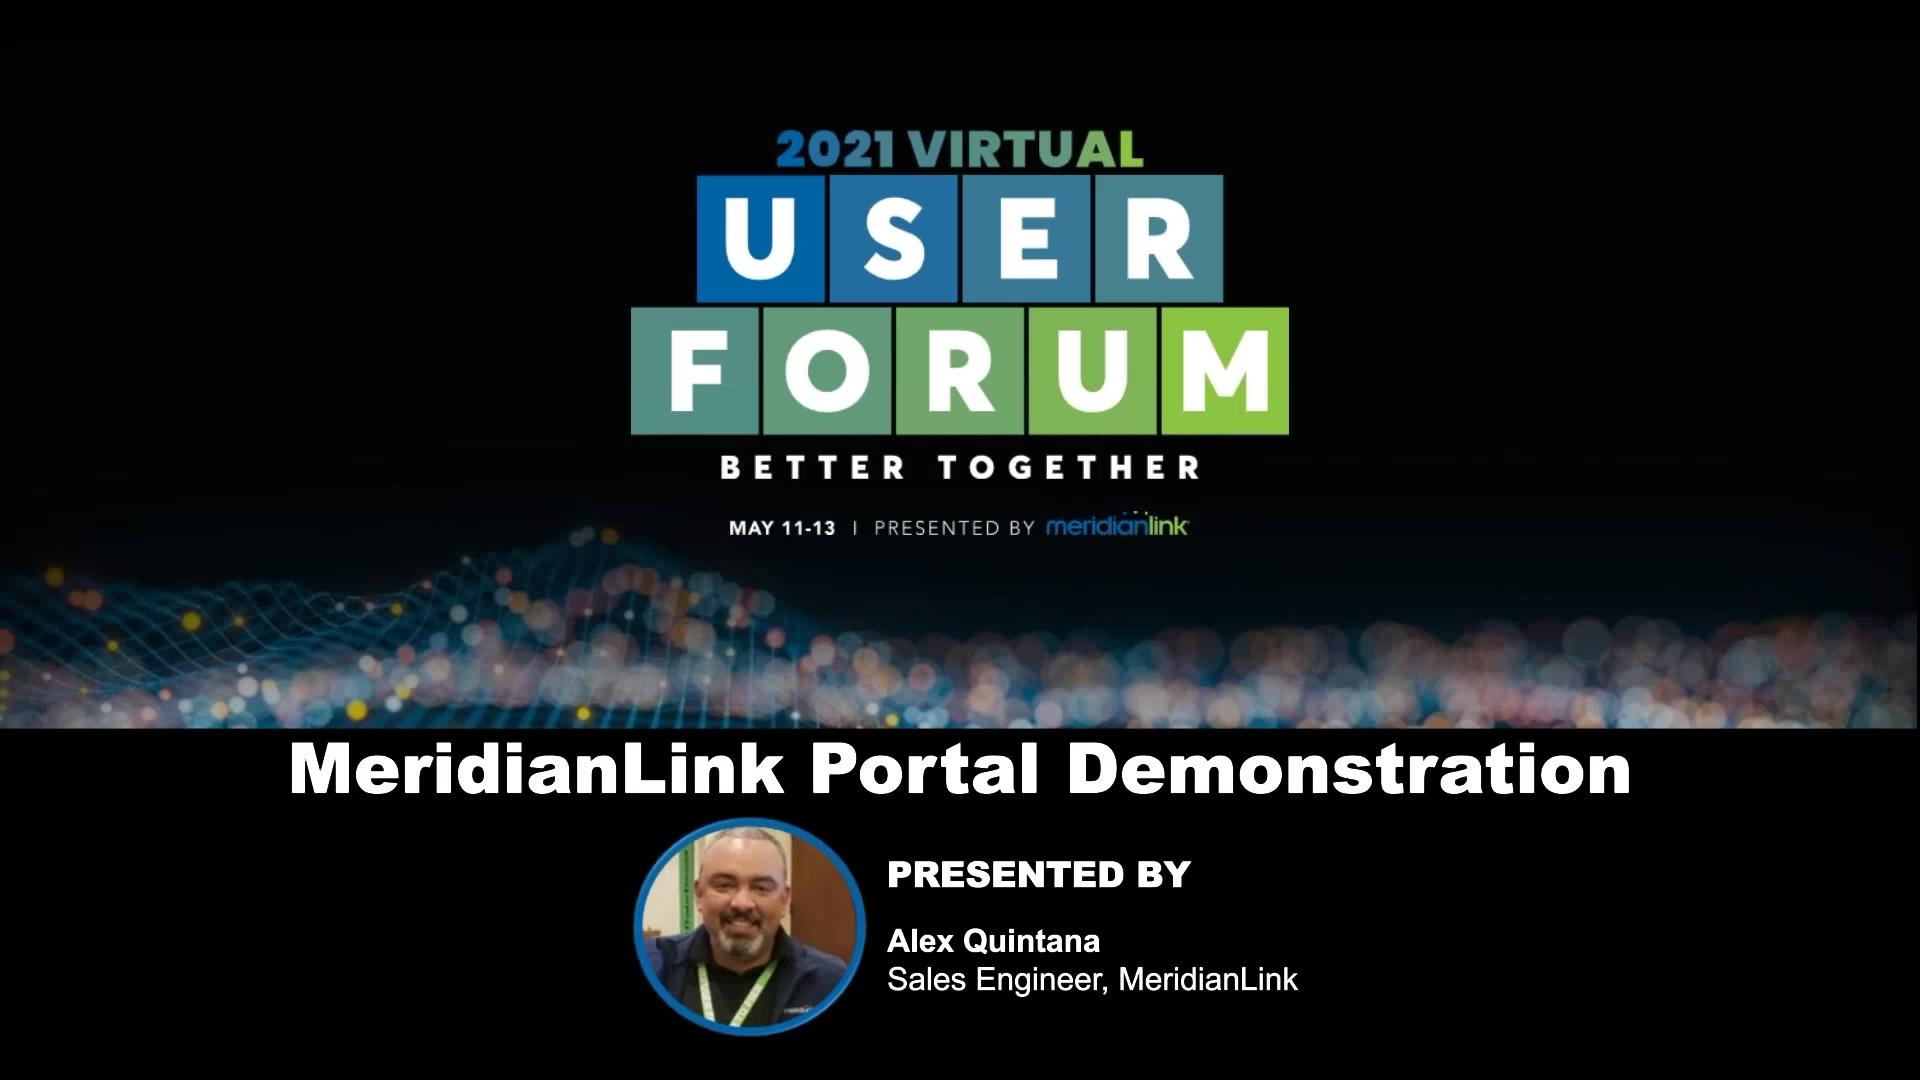 MeridianLink Portal Demonstration